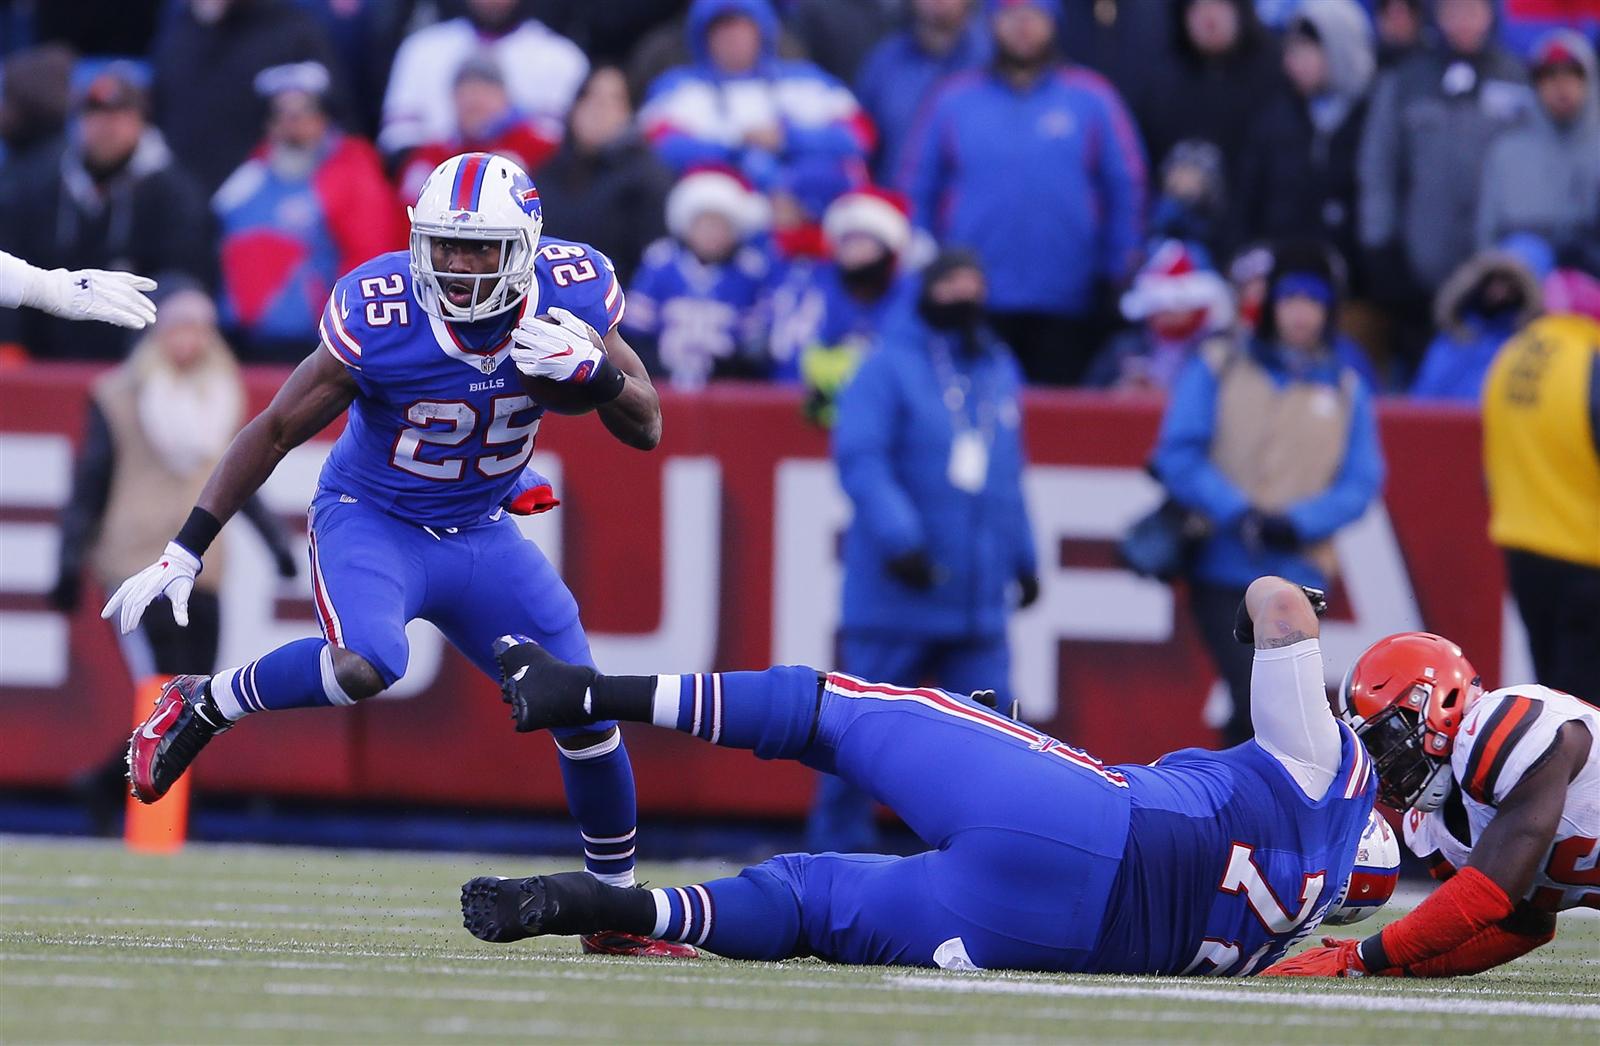 LeSean McCoy makes a move. (Mark Mulville/Buffalo News)